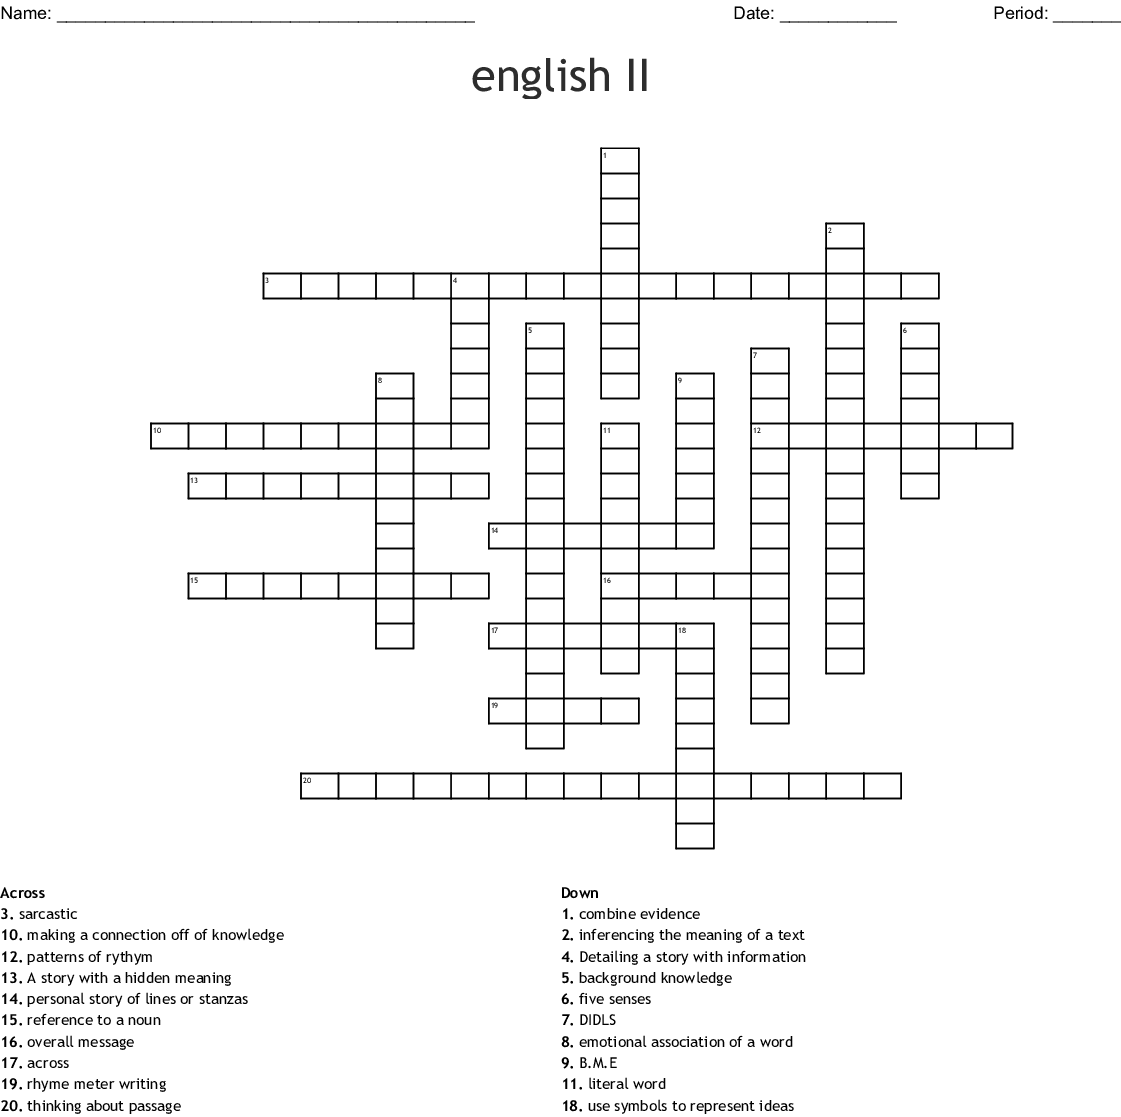 English 2 Crossword Puzzle